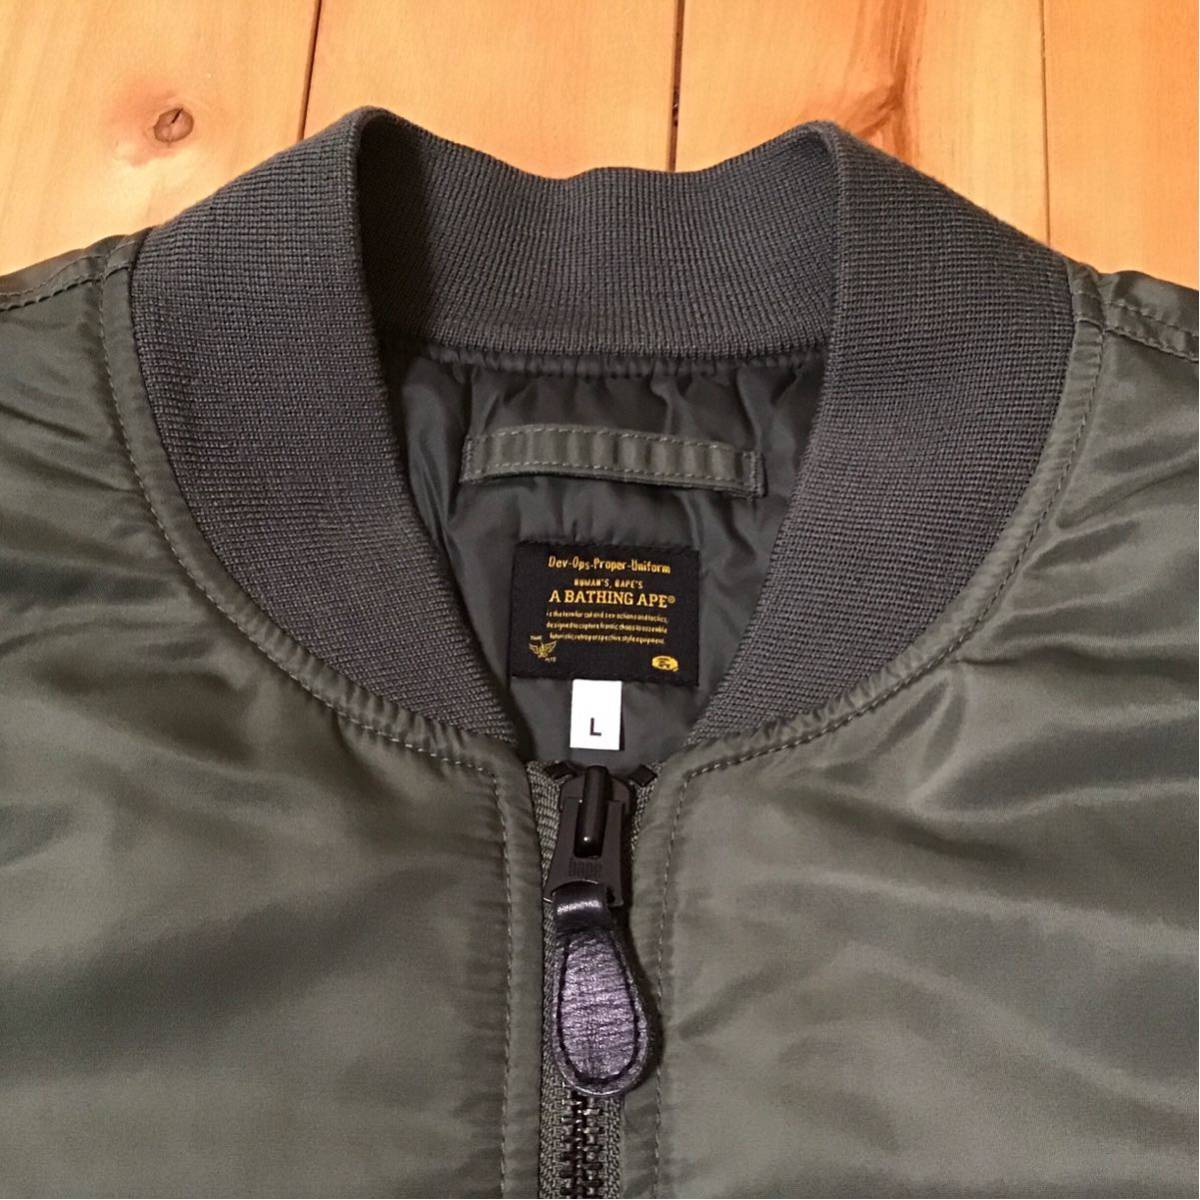 BAPE MA-1 jacket Lサイズ a bathing ape general logo 1st camo エイプ ベイプ アベイシングエイプ 迷彩 カーキ